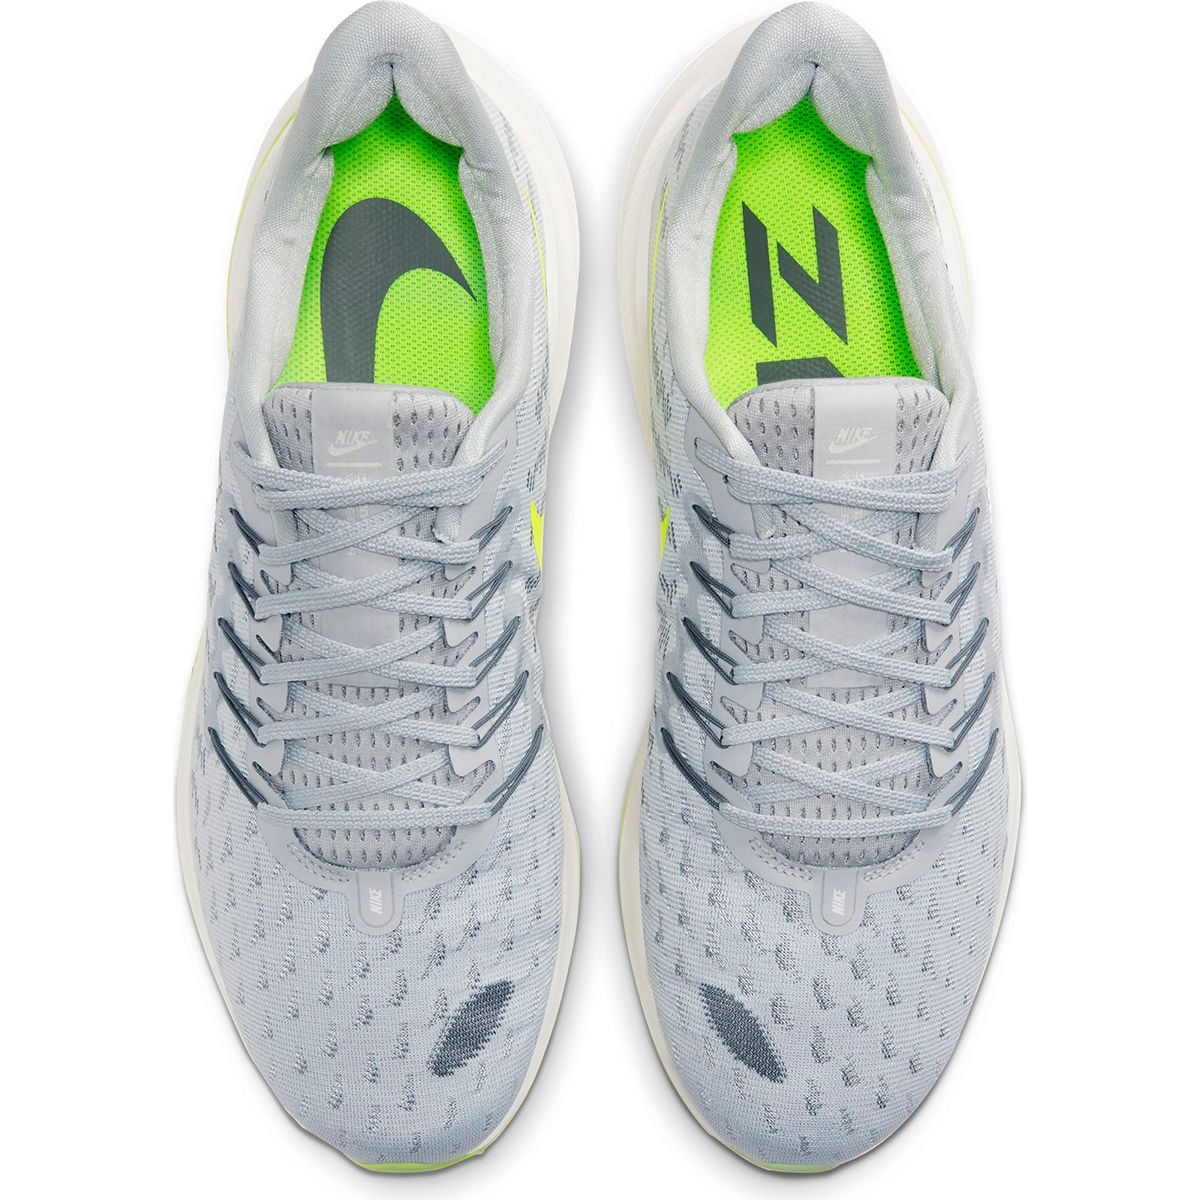 Men's Nike Air Zoom Vomero 14 Running Shoe - Color: Grey Fog/Smoke Grey/Volt/Sail (Regular Width) - Size: 6, Grey Fog/Smoke Grey/Volt/Sail, large, image 3